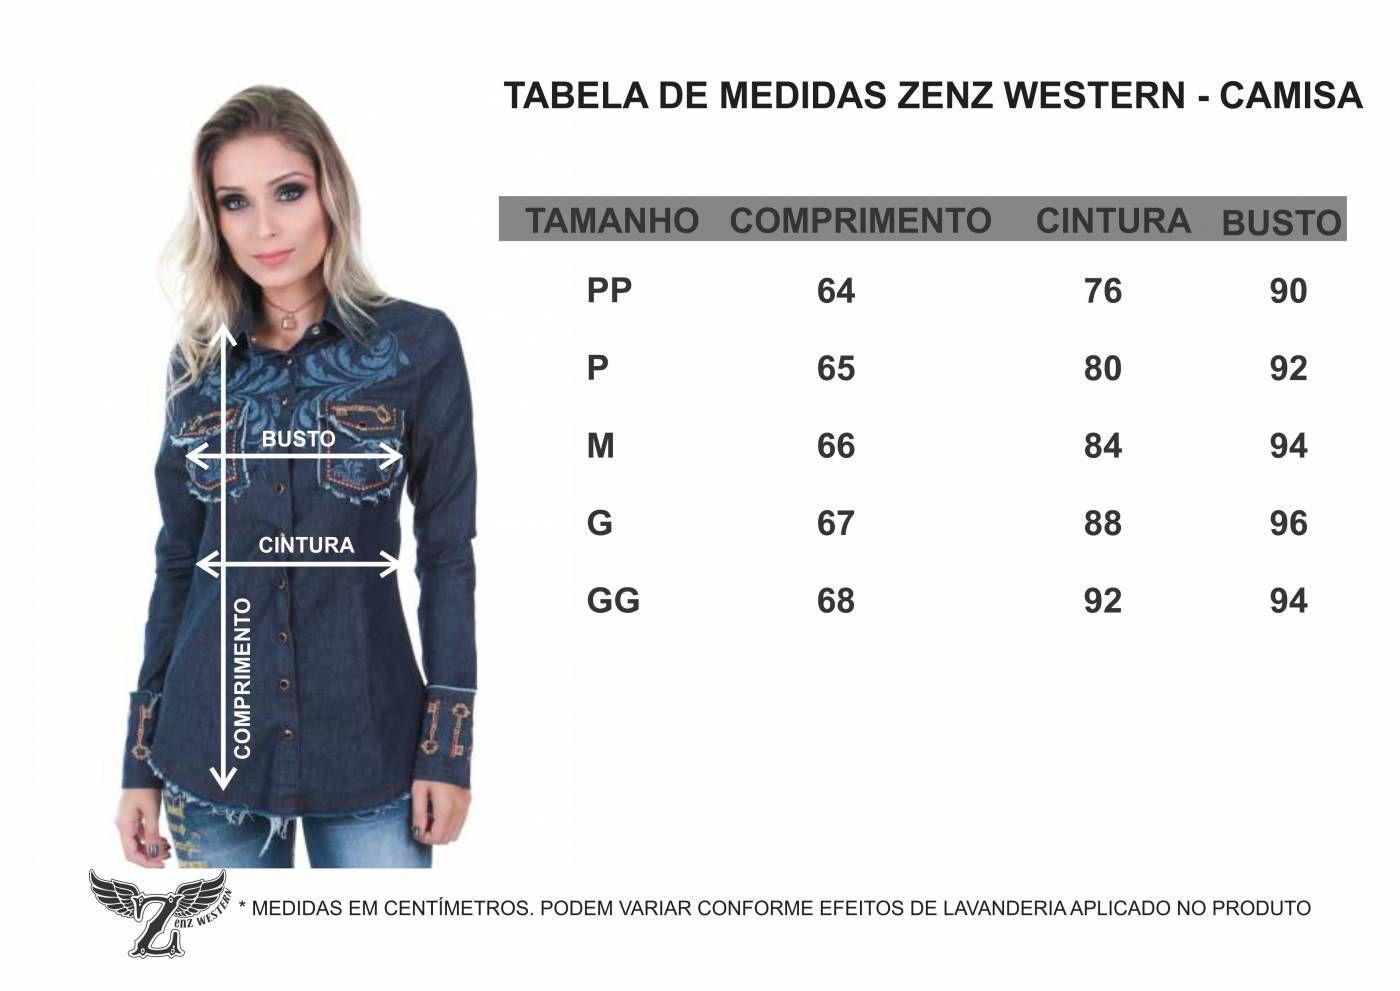 Camisa Feminina Happyness Zenz Western